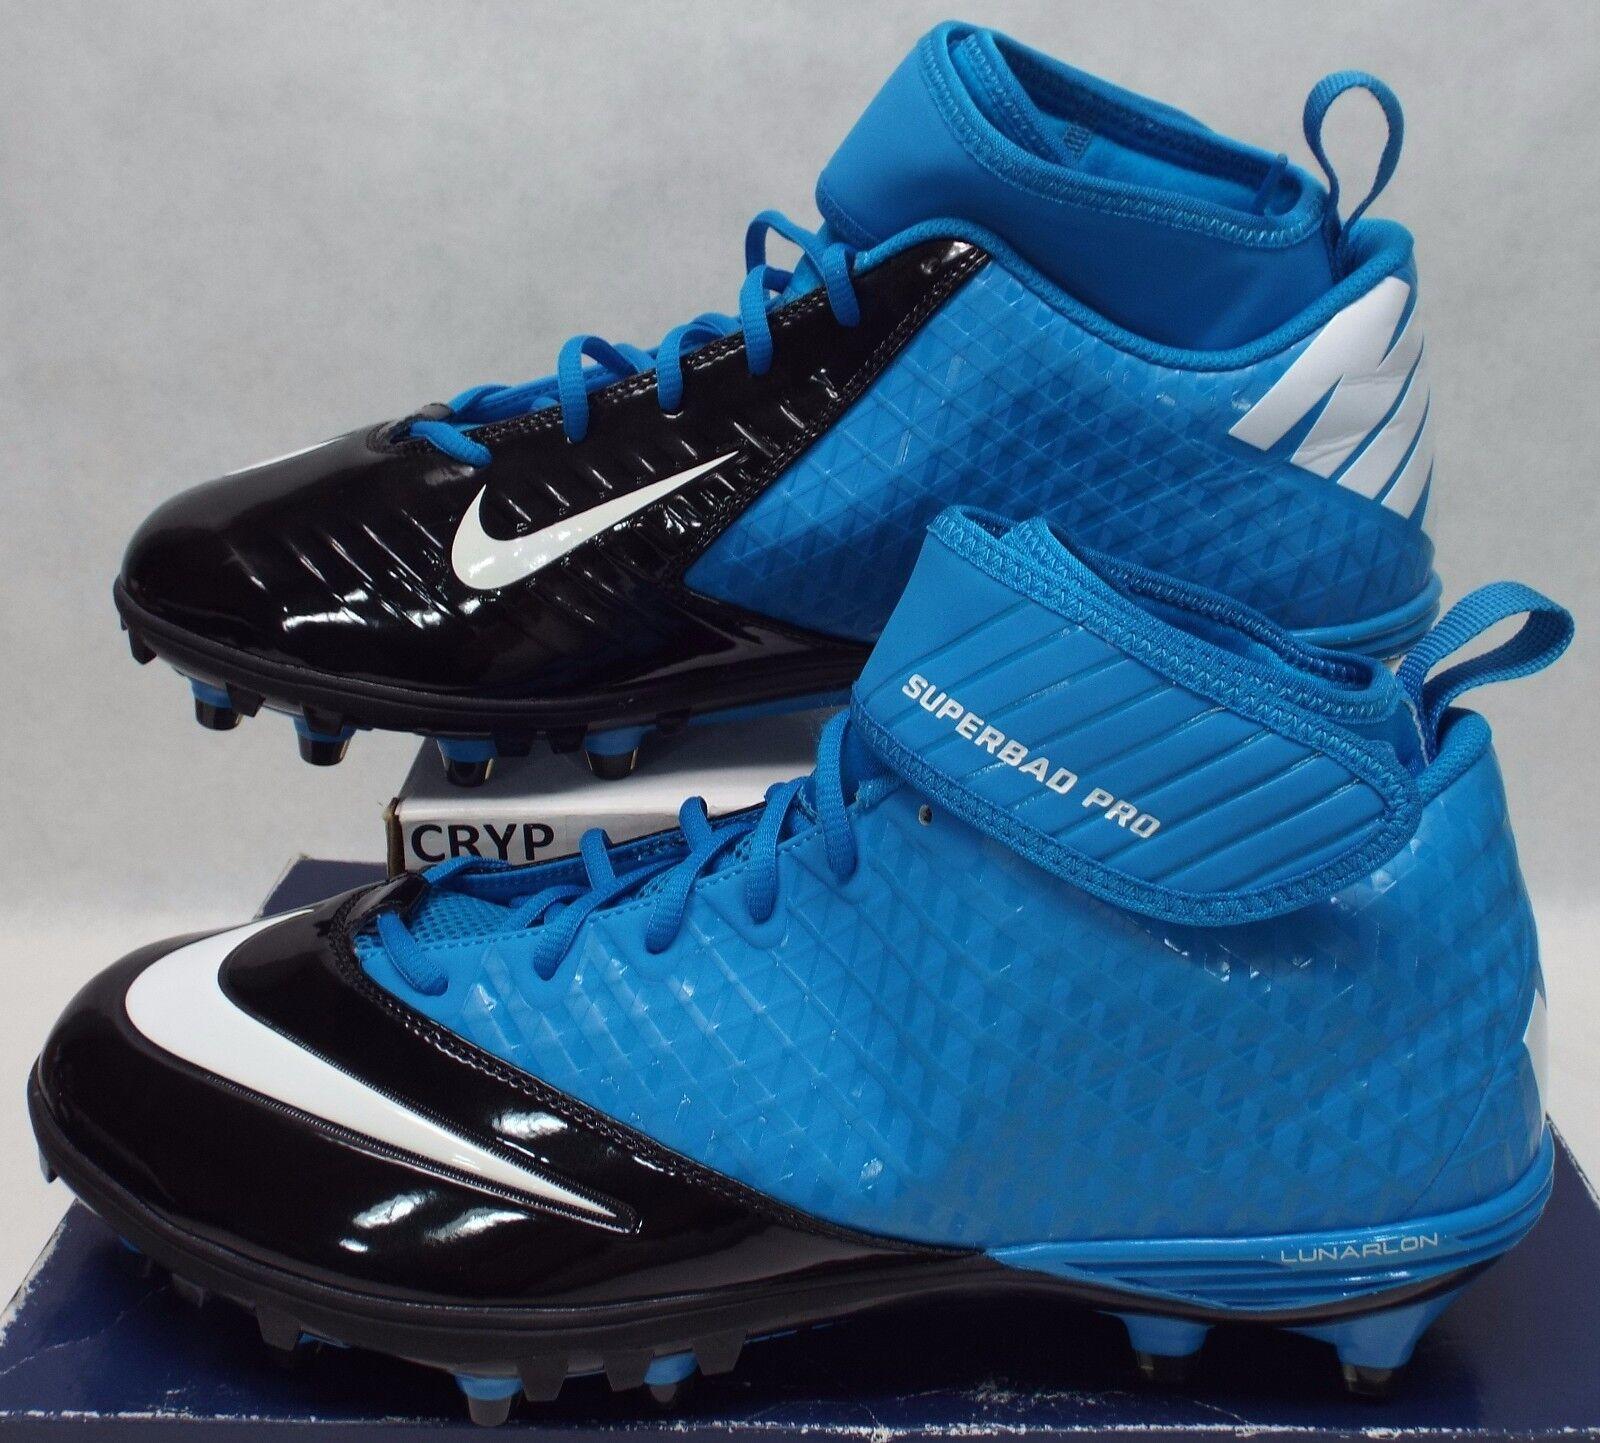 New Mens 14 NIKE Lunarlon Superbad Blue Black Cleats Shoes Price reduction